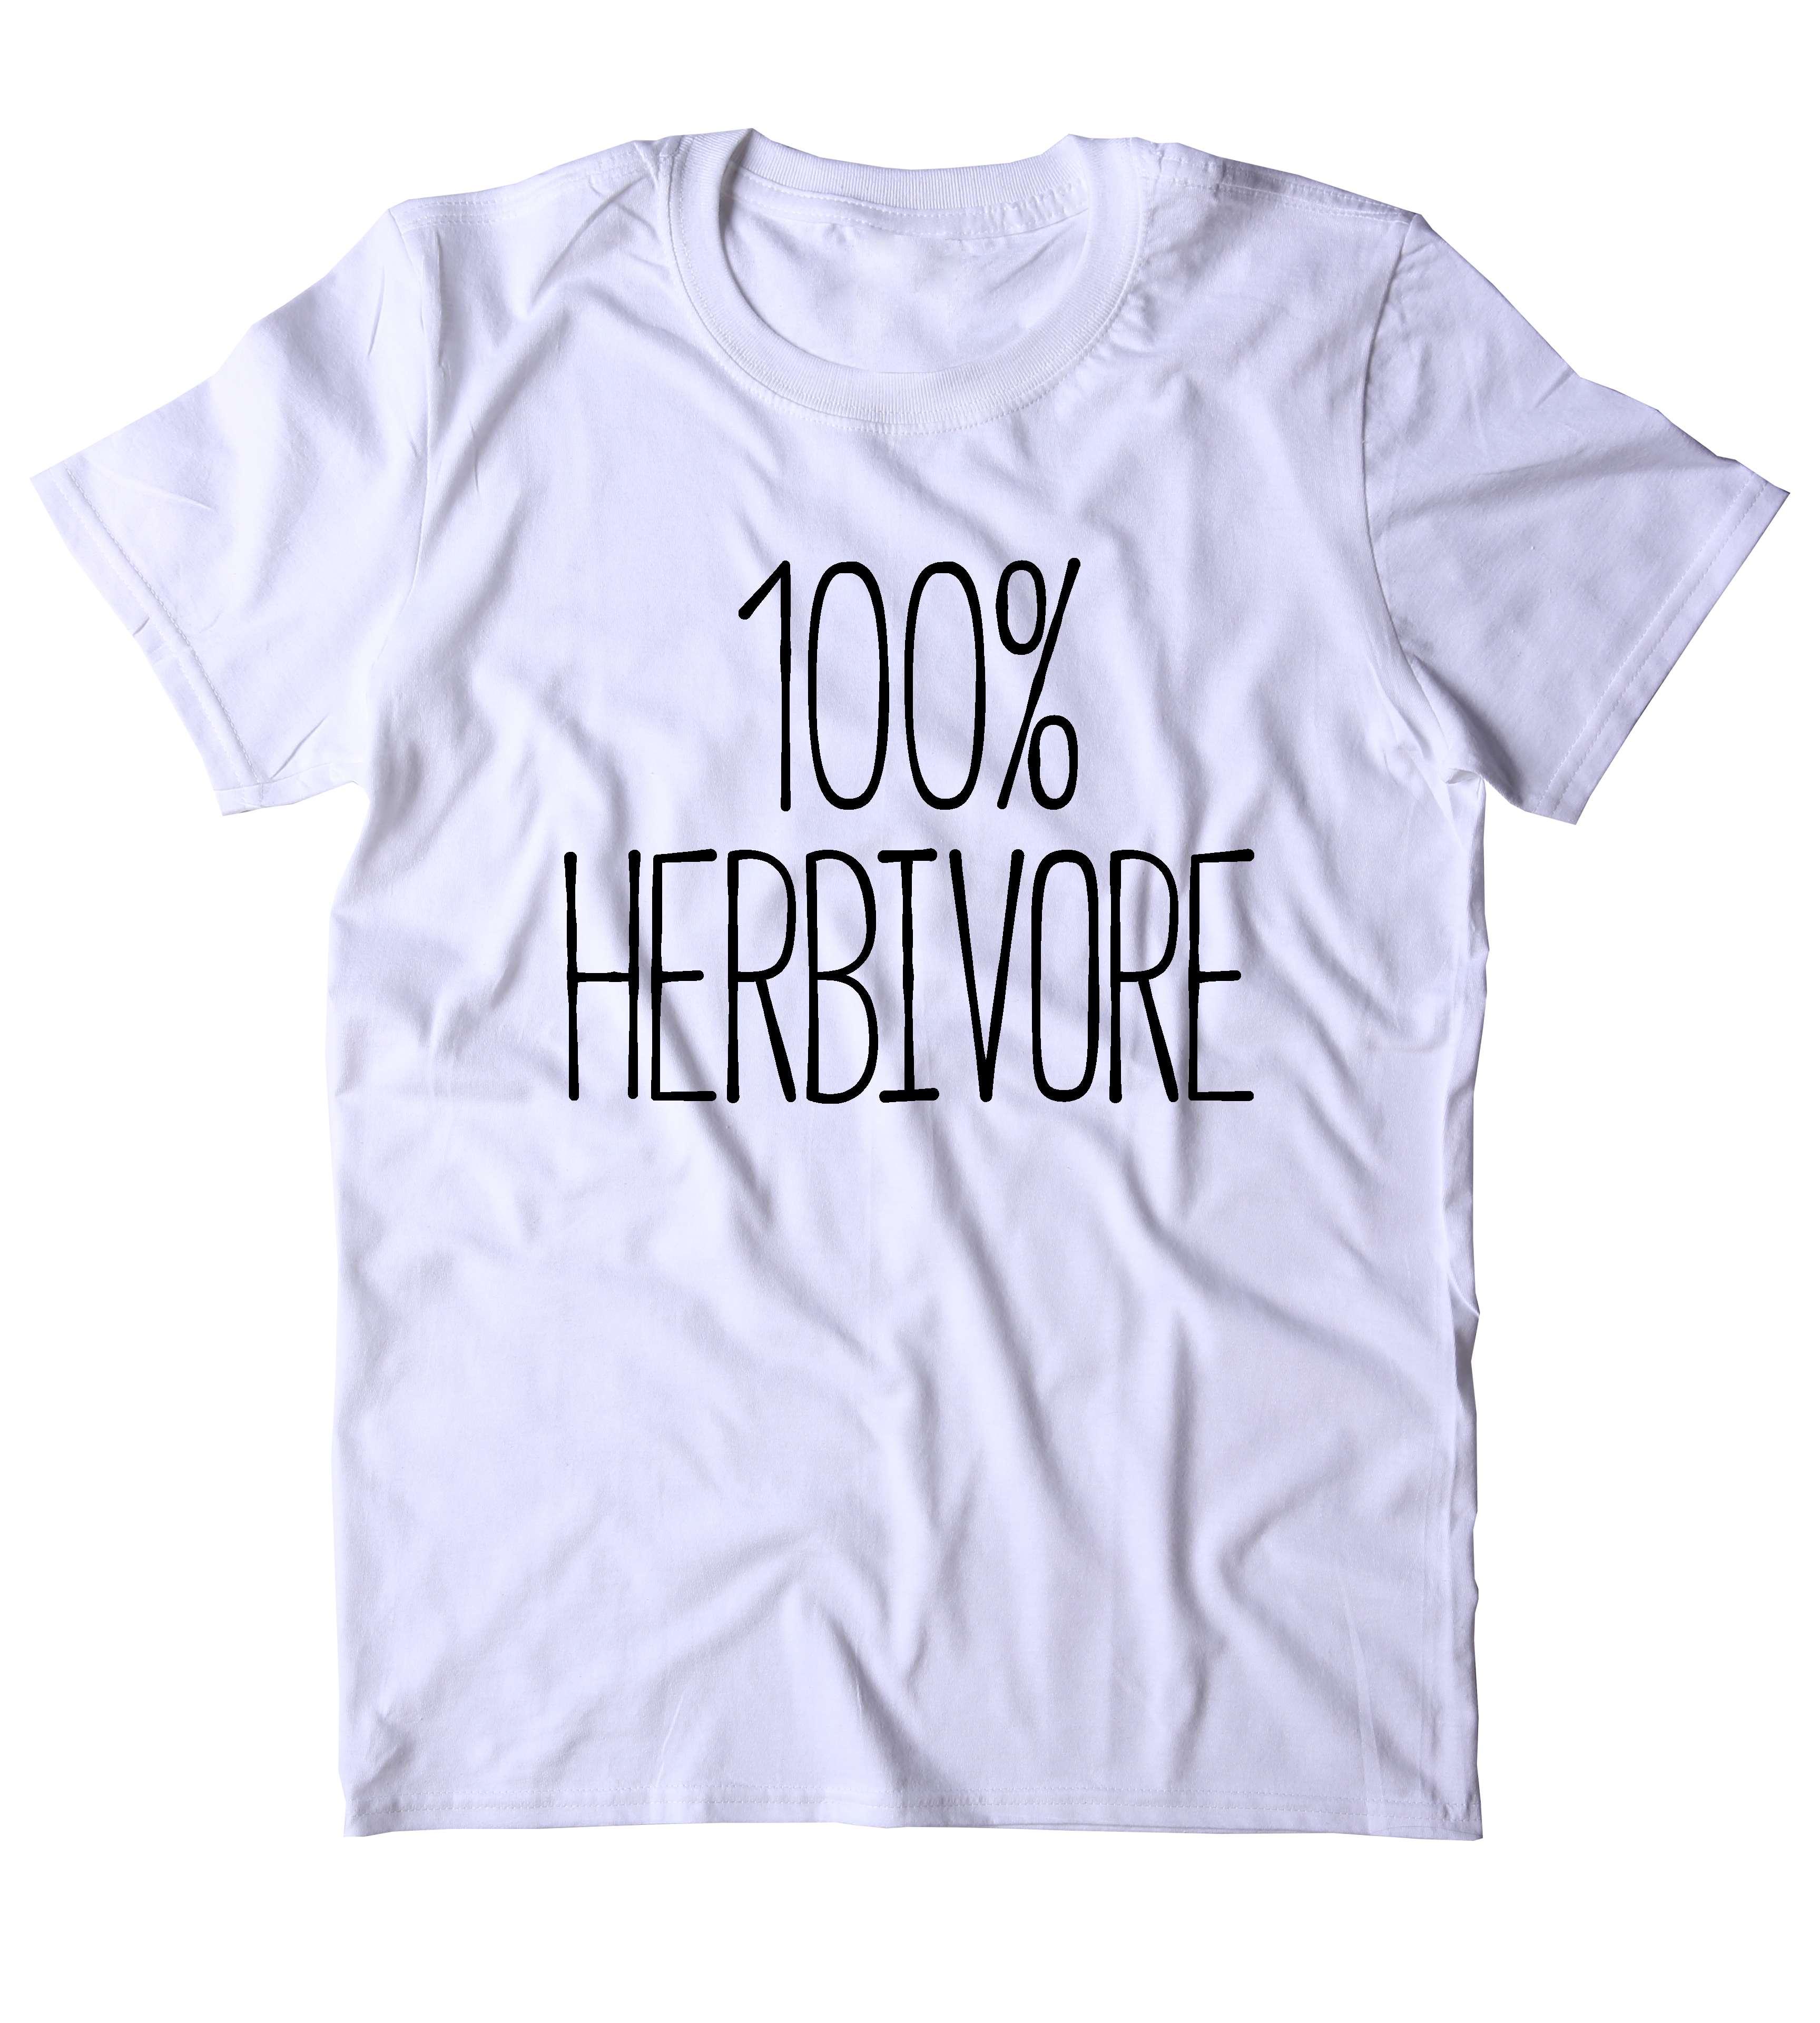 4058e4f507 100% Herbivore T-Shirt Funny Vegan Vegetarian Plant Eater Animal Right  Activist Clothing Tumblr Shirt on Storenvy